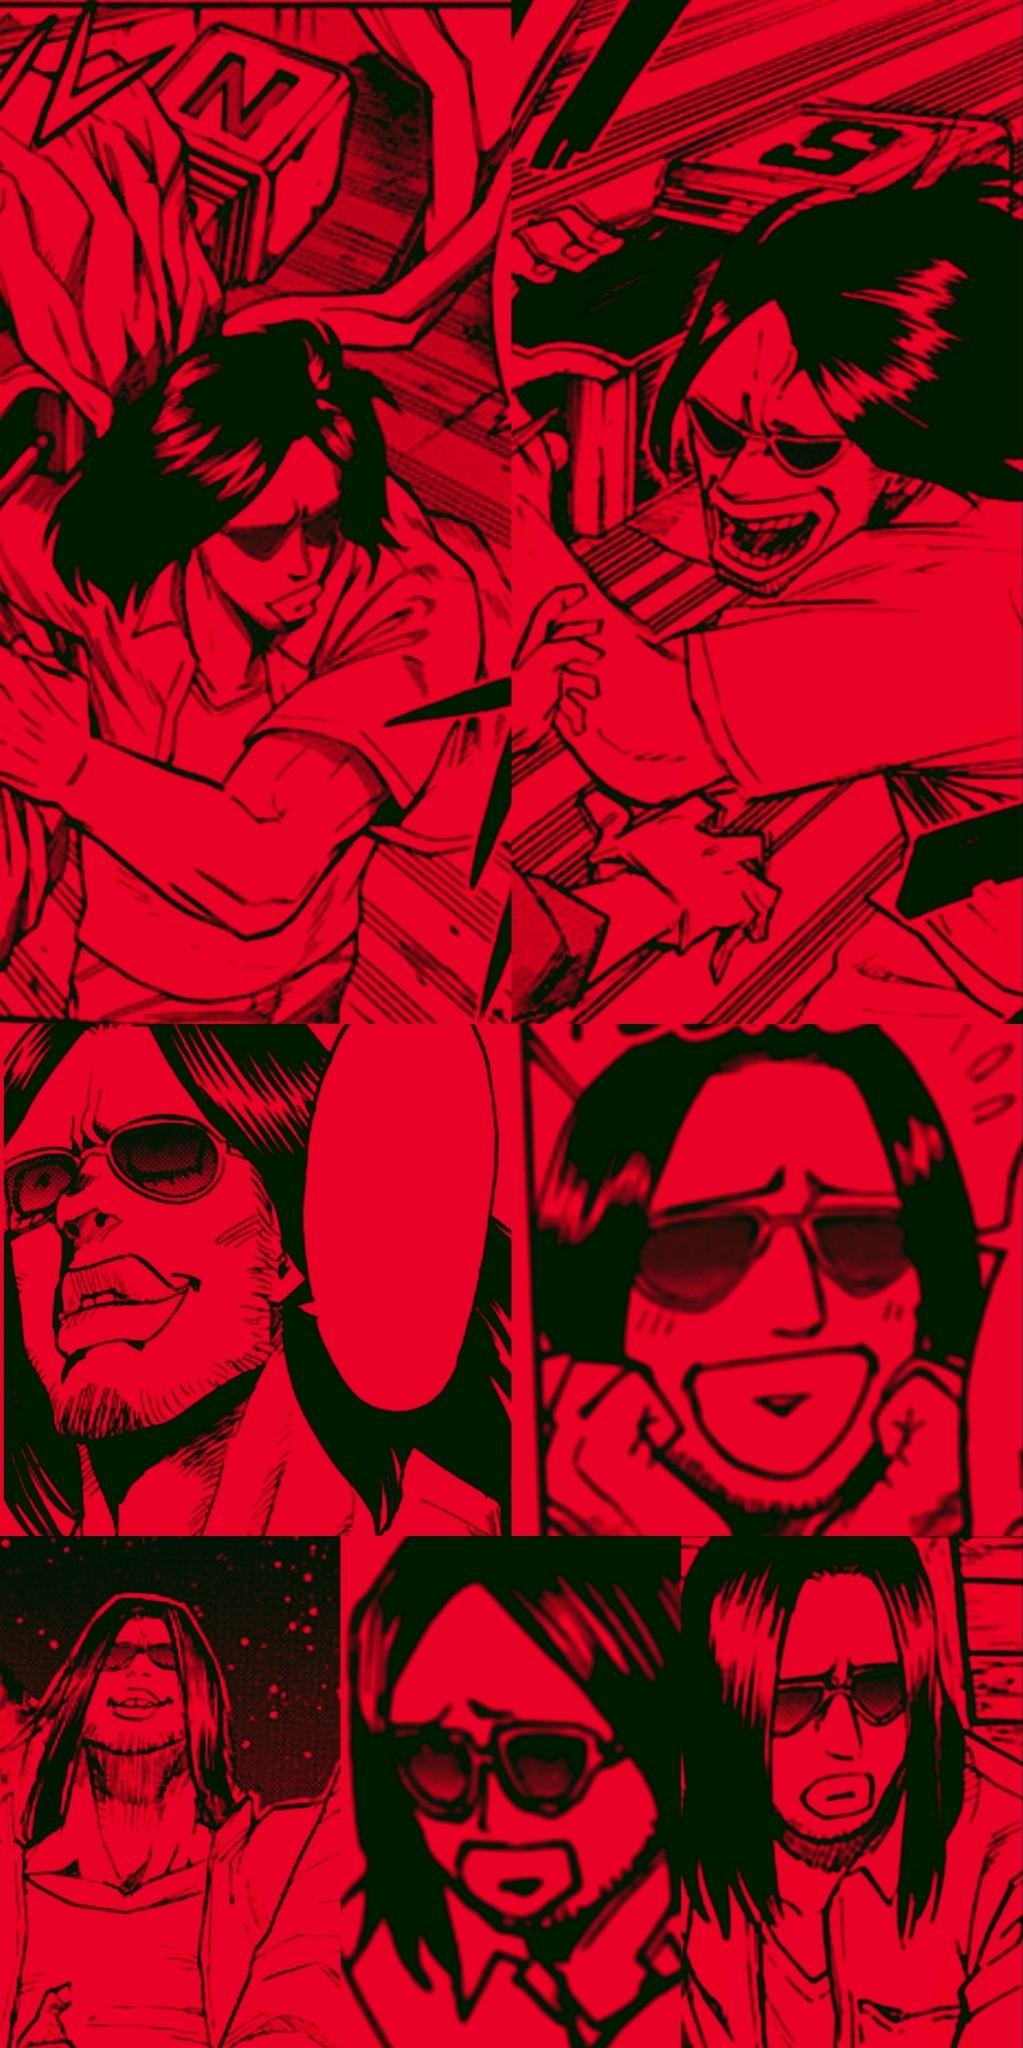 My Hero Academia Manga Wallpaper Explore Tumblr Posts And Blogs Tumgir